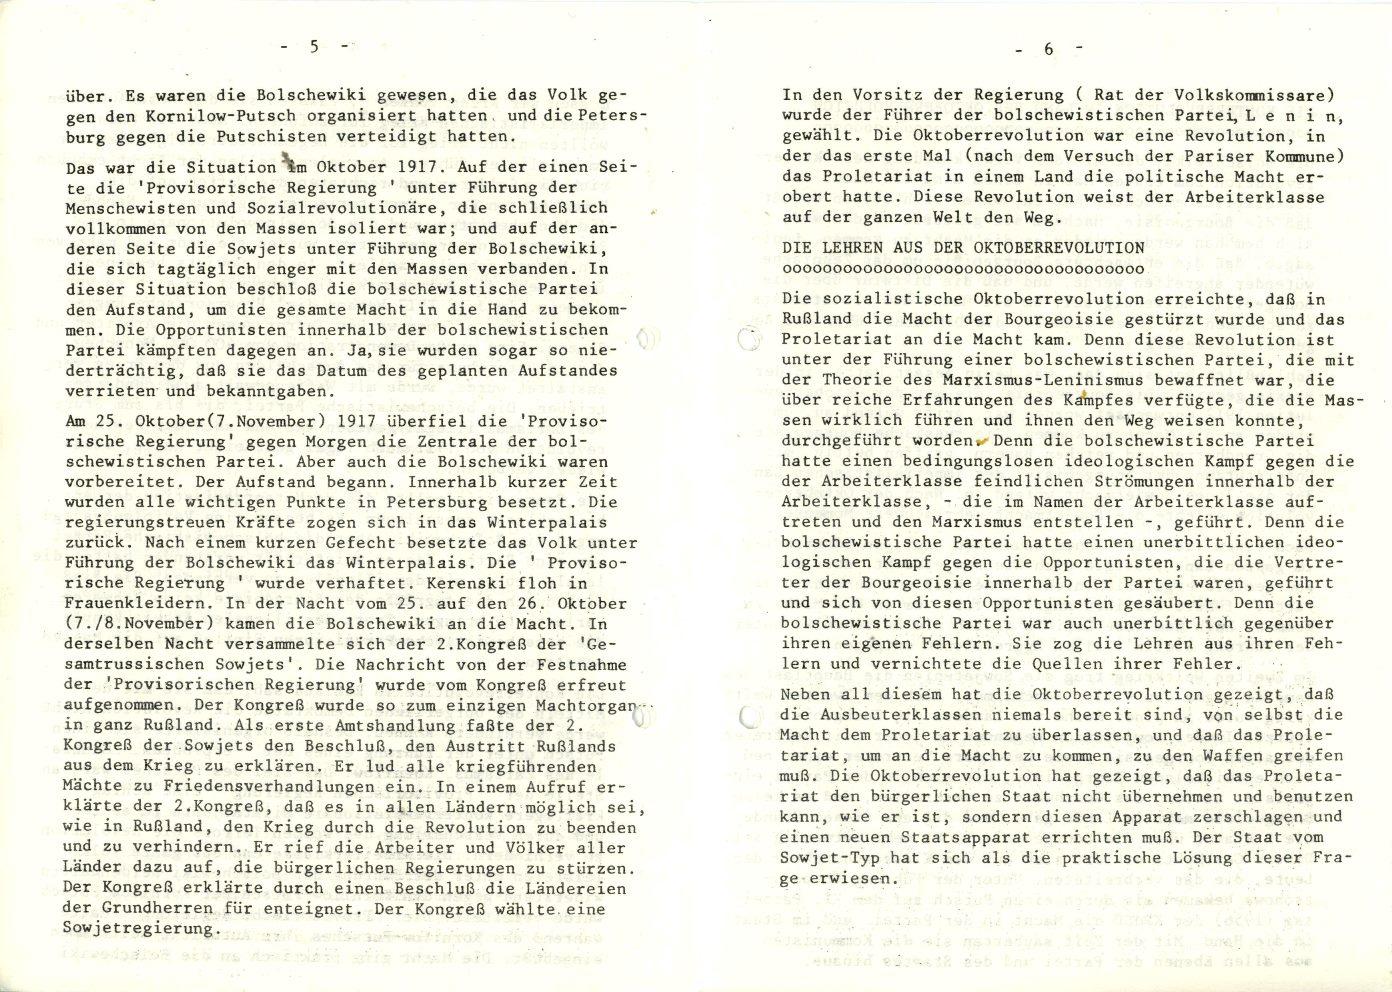 TKPML_1977_05_04